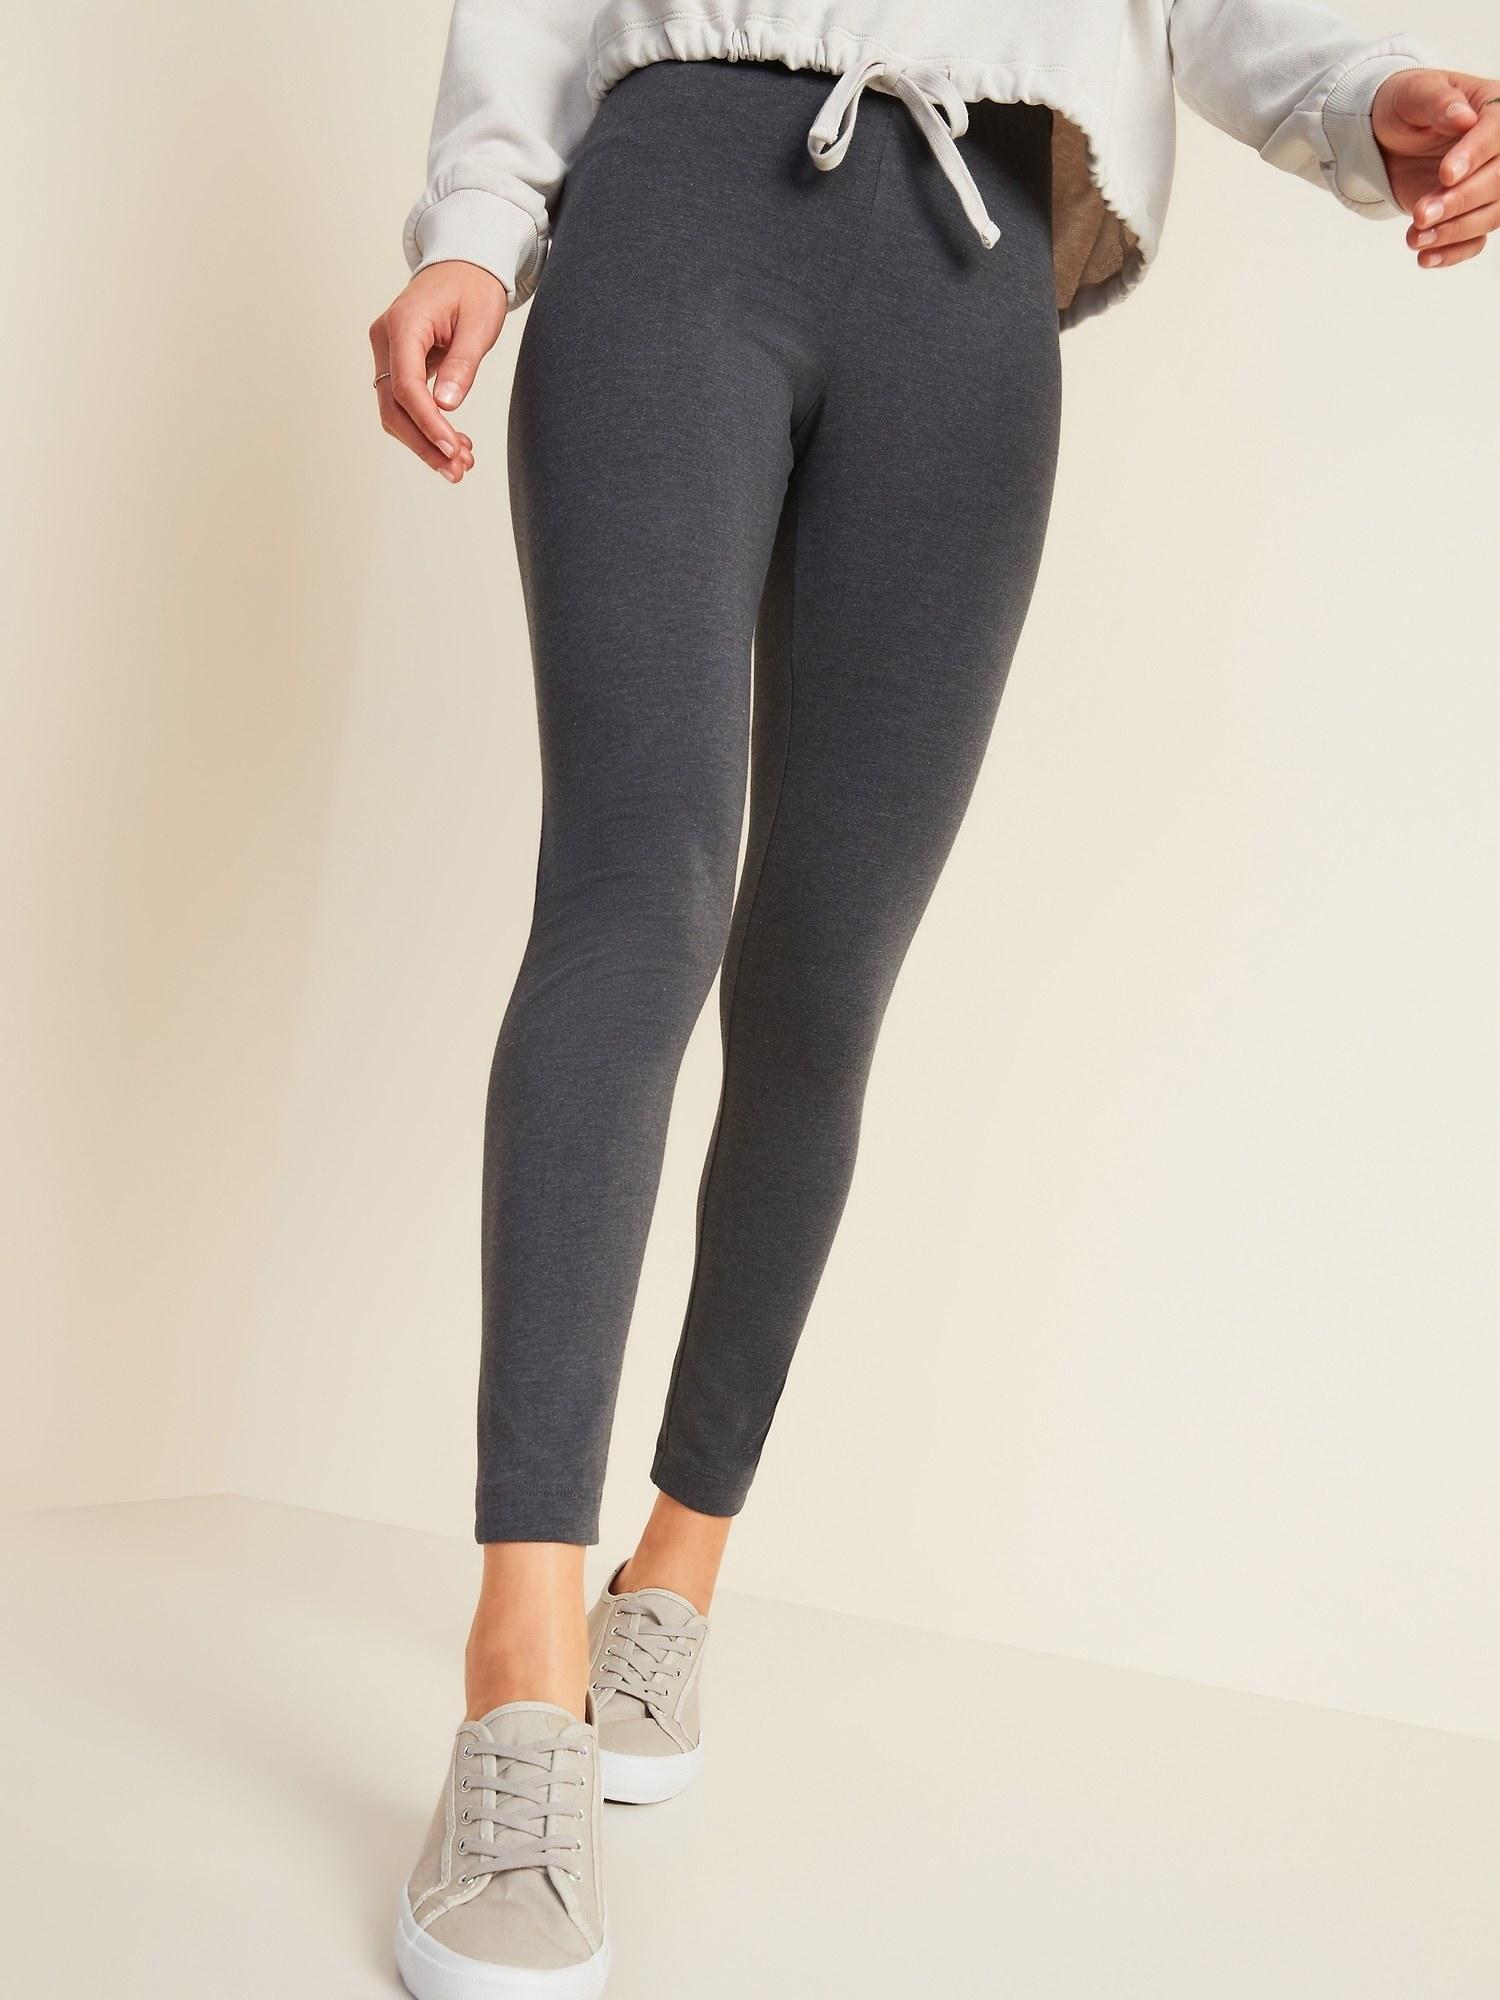 a model in gray leggings